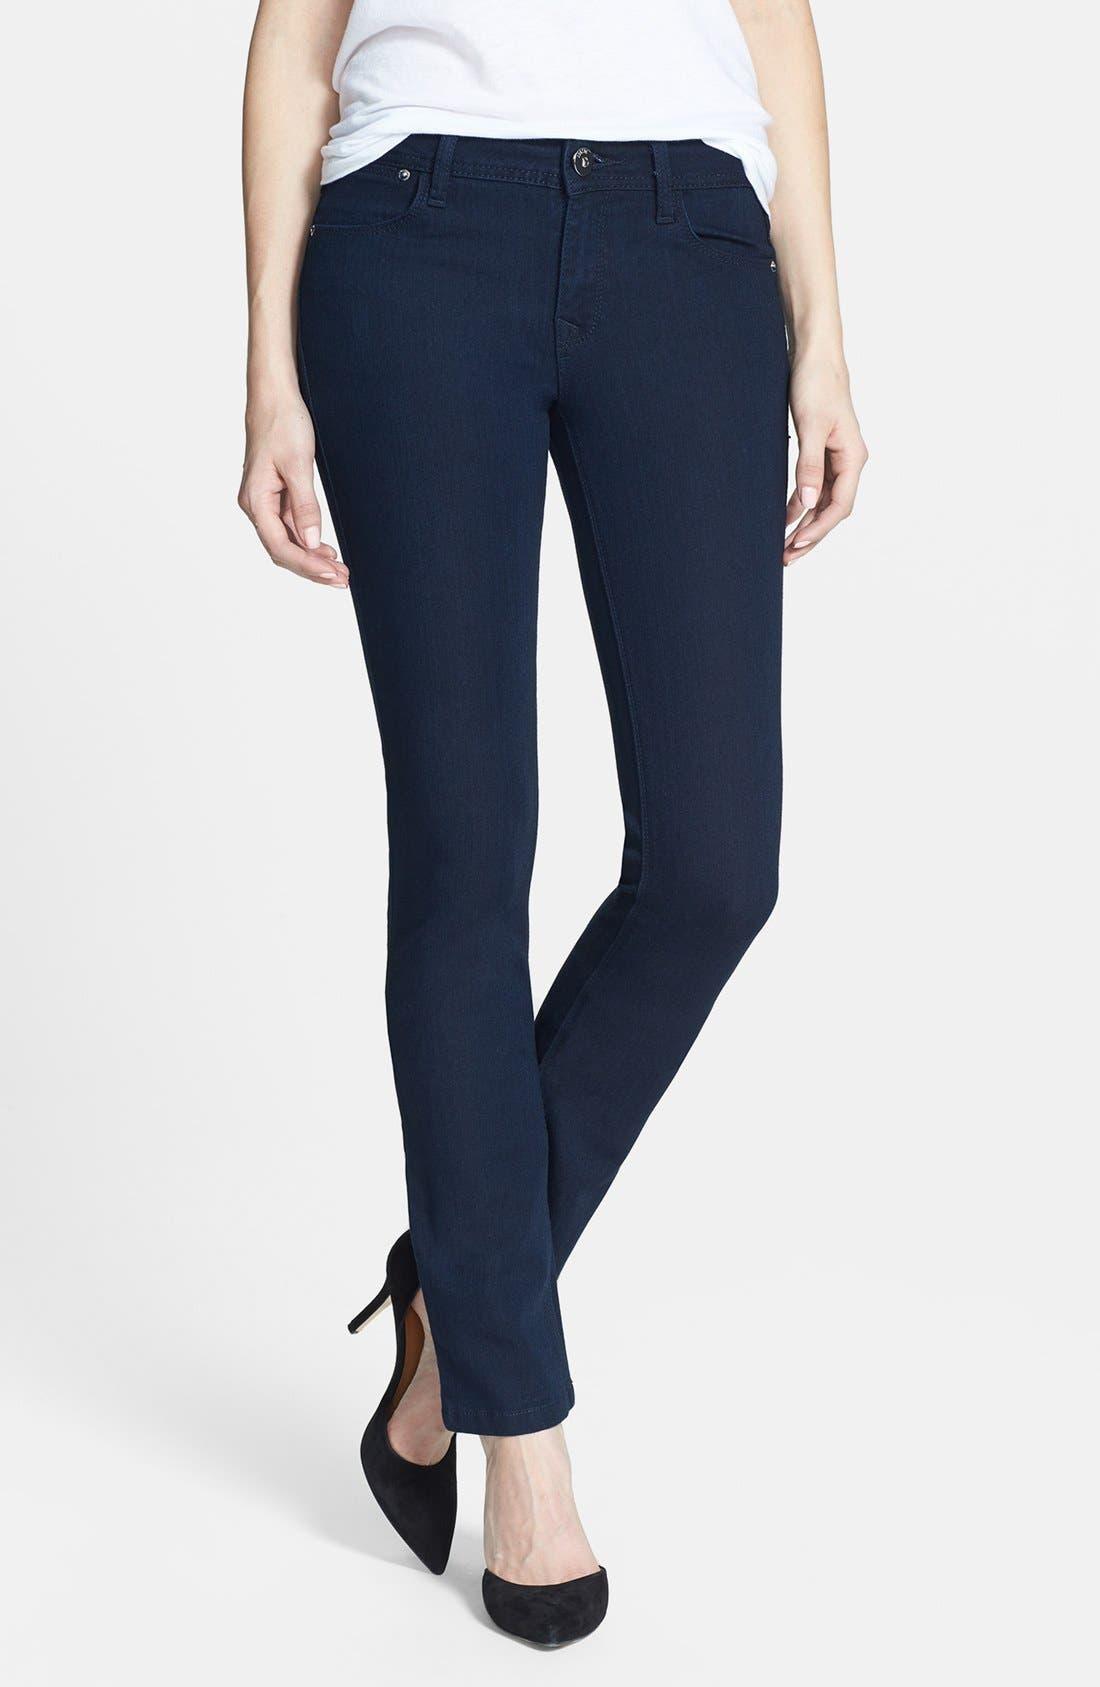 Main Image - DL1961 'Coco' Curvy Straight Jeans (Flatiron)